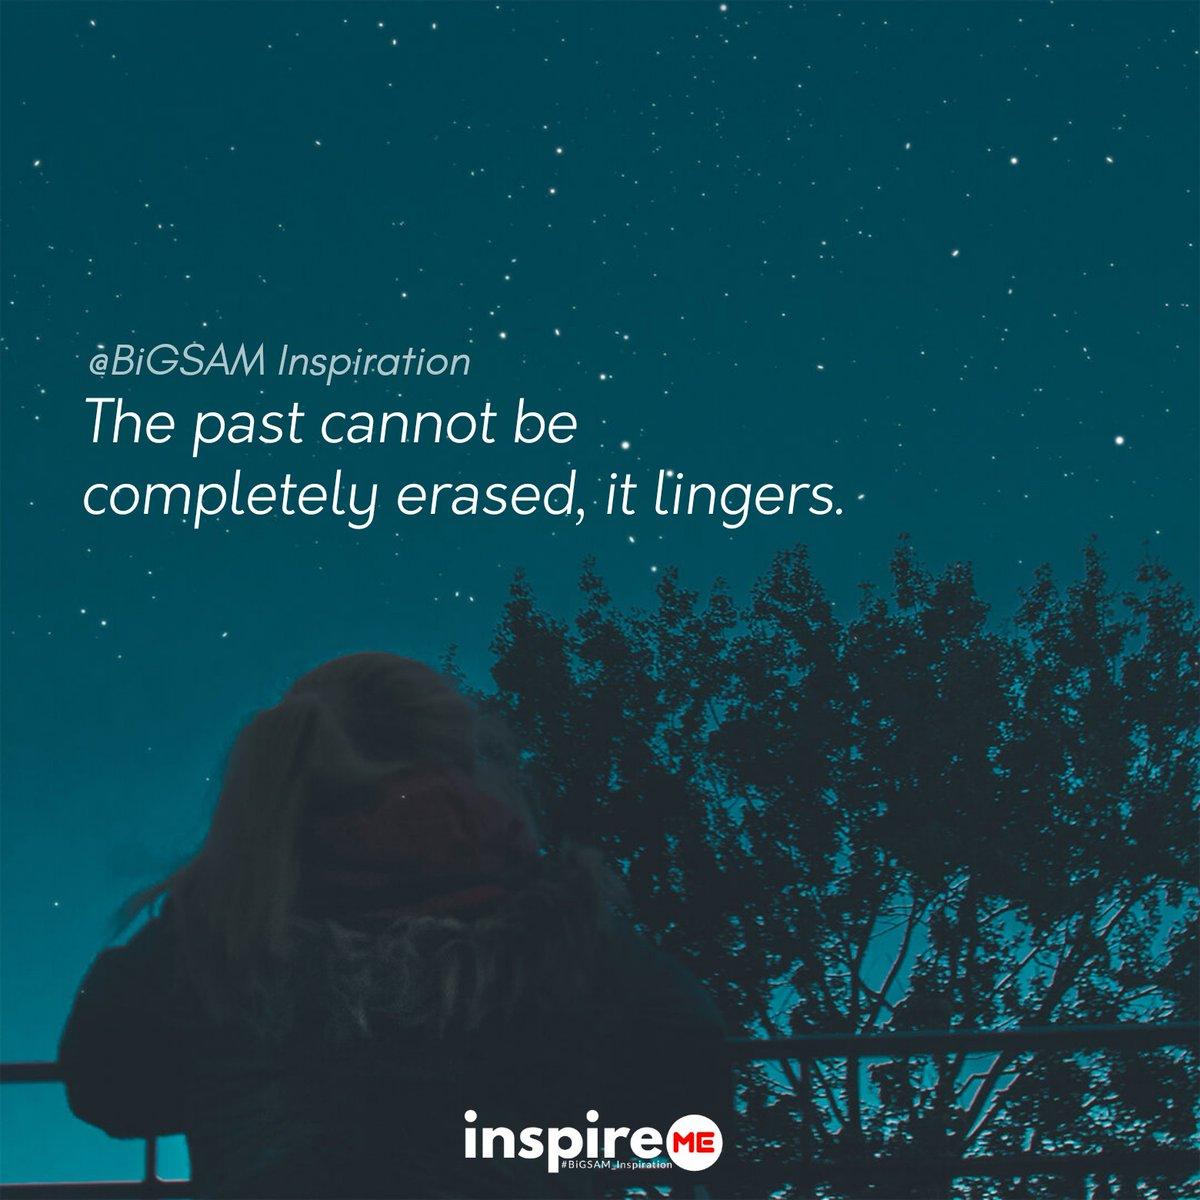 °inspireME #transformationtuesday #bigsam_inspiration #quote #explore #entrepreneur #encouragement #inspiration #inspireME #comment #TFLers #tweegram #quoteoftheday #doit #doityourself #funny #life #instagood #love #photooftheday #igers #instadaily #true #instamood #wordstoliveby